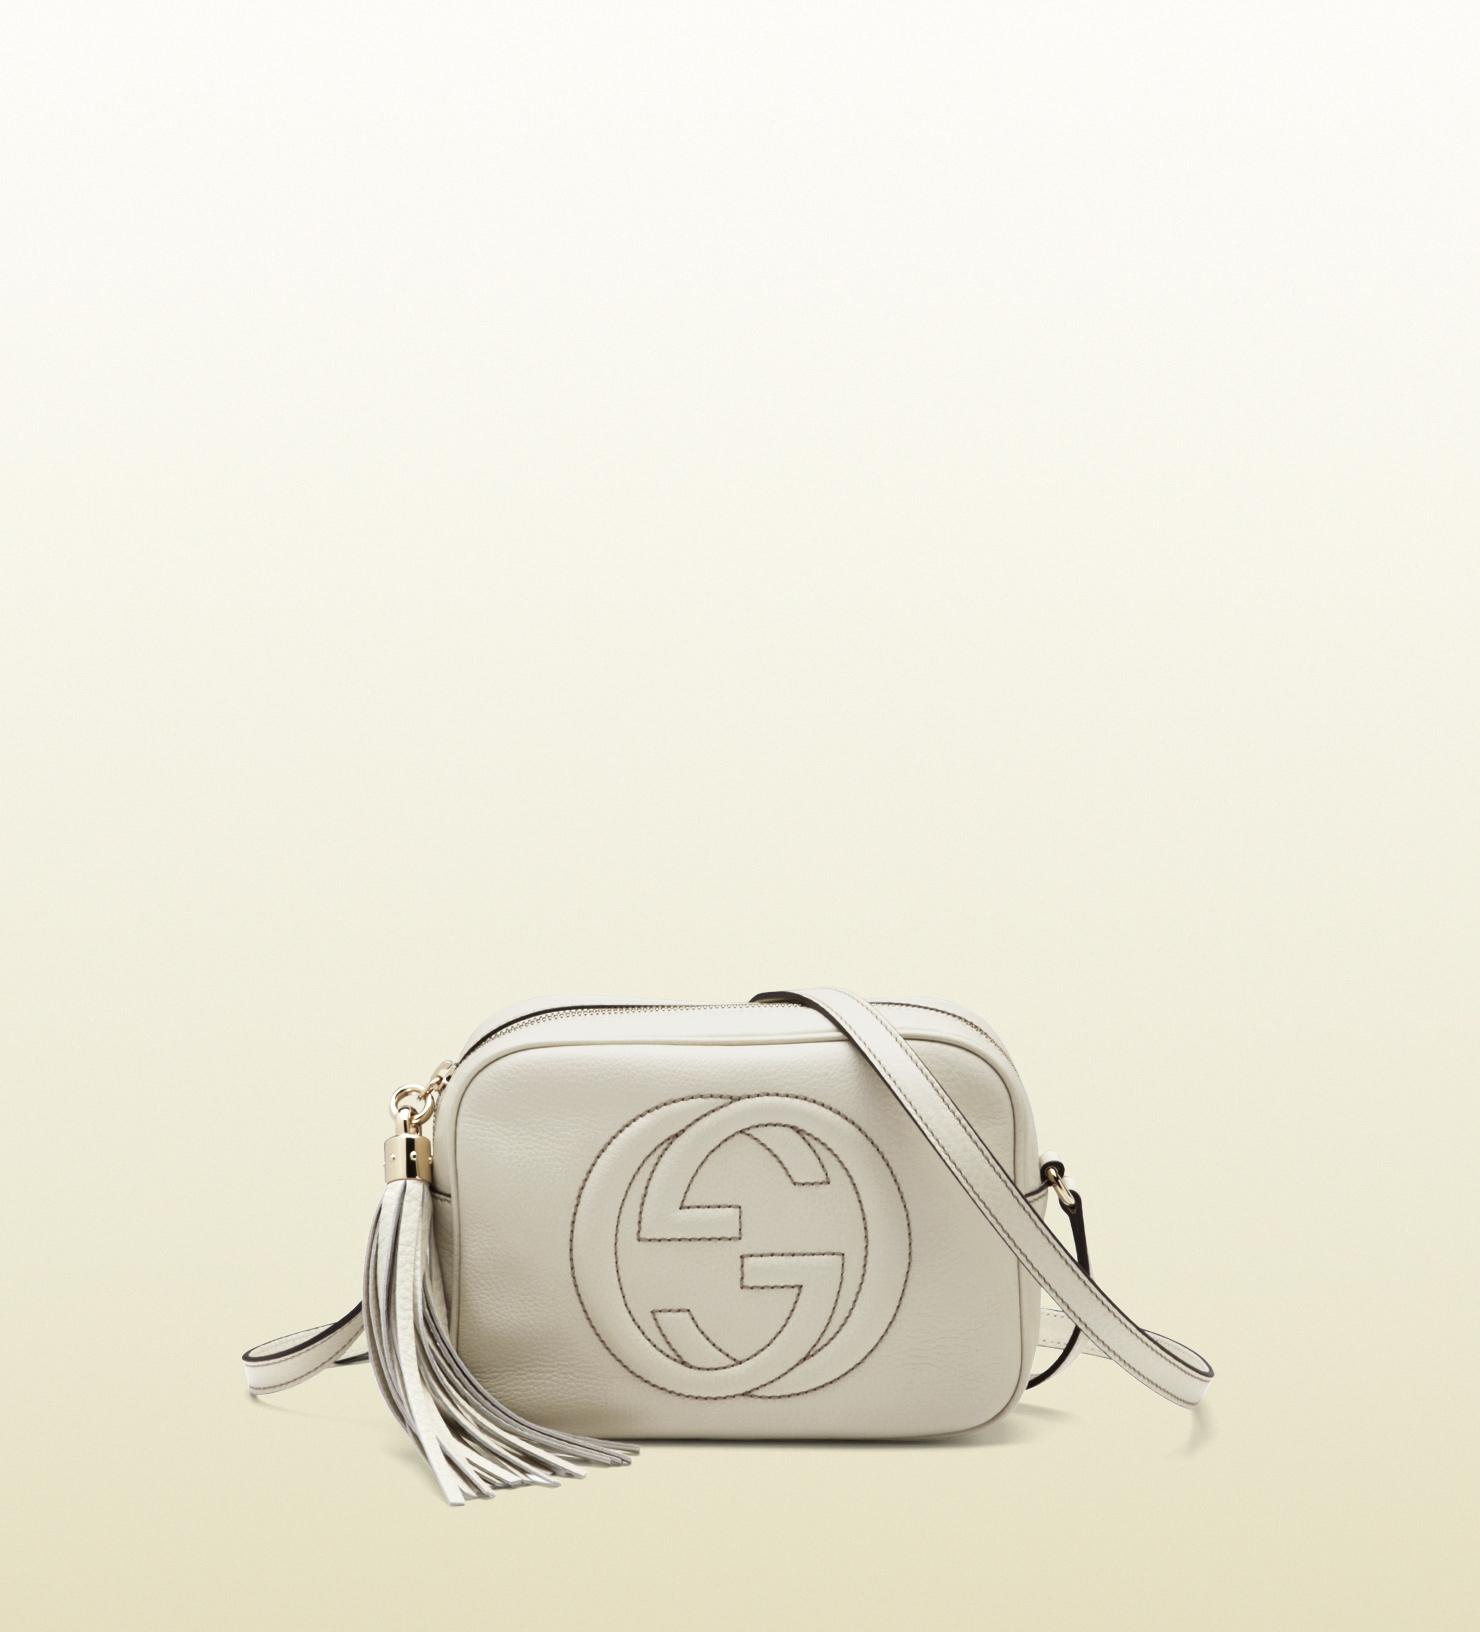 Gucci - soho disco bag 308364A7M0G9022